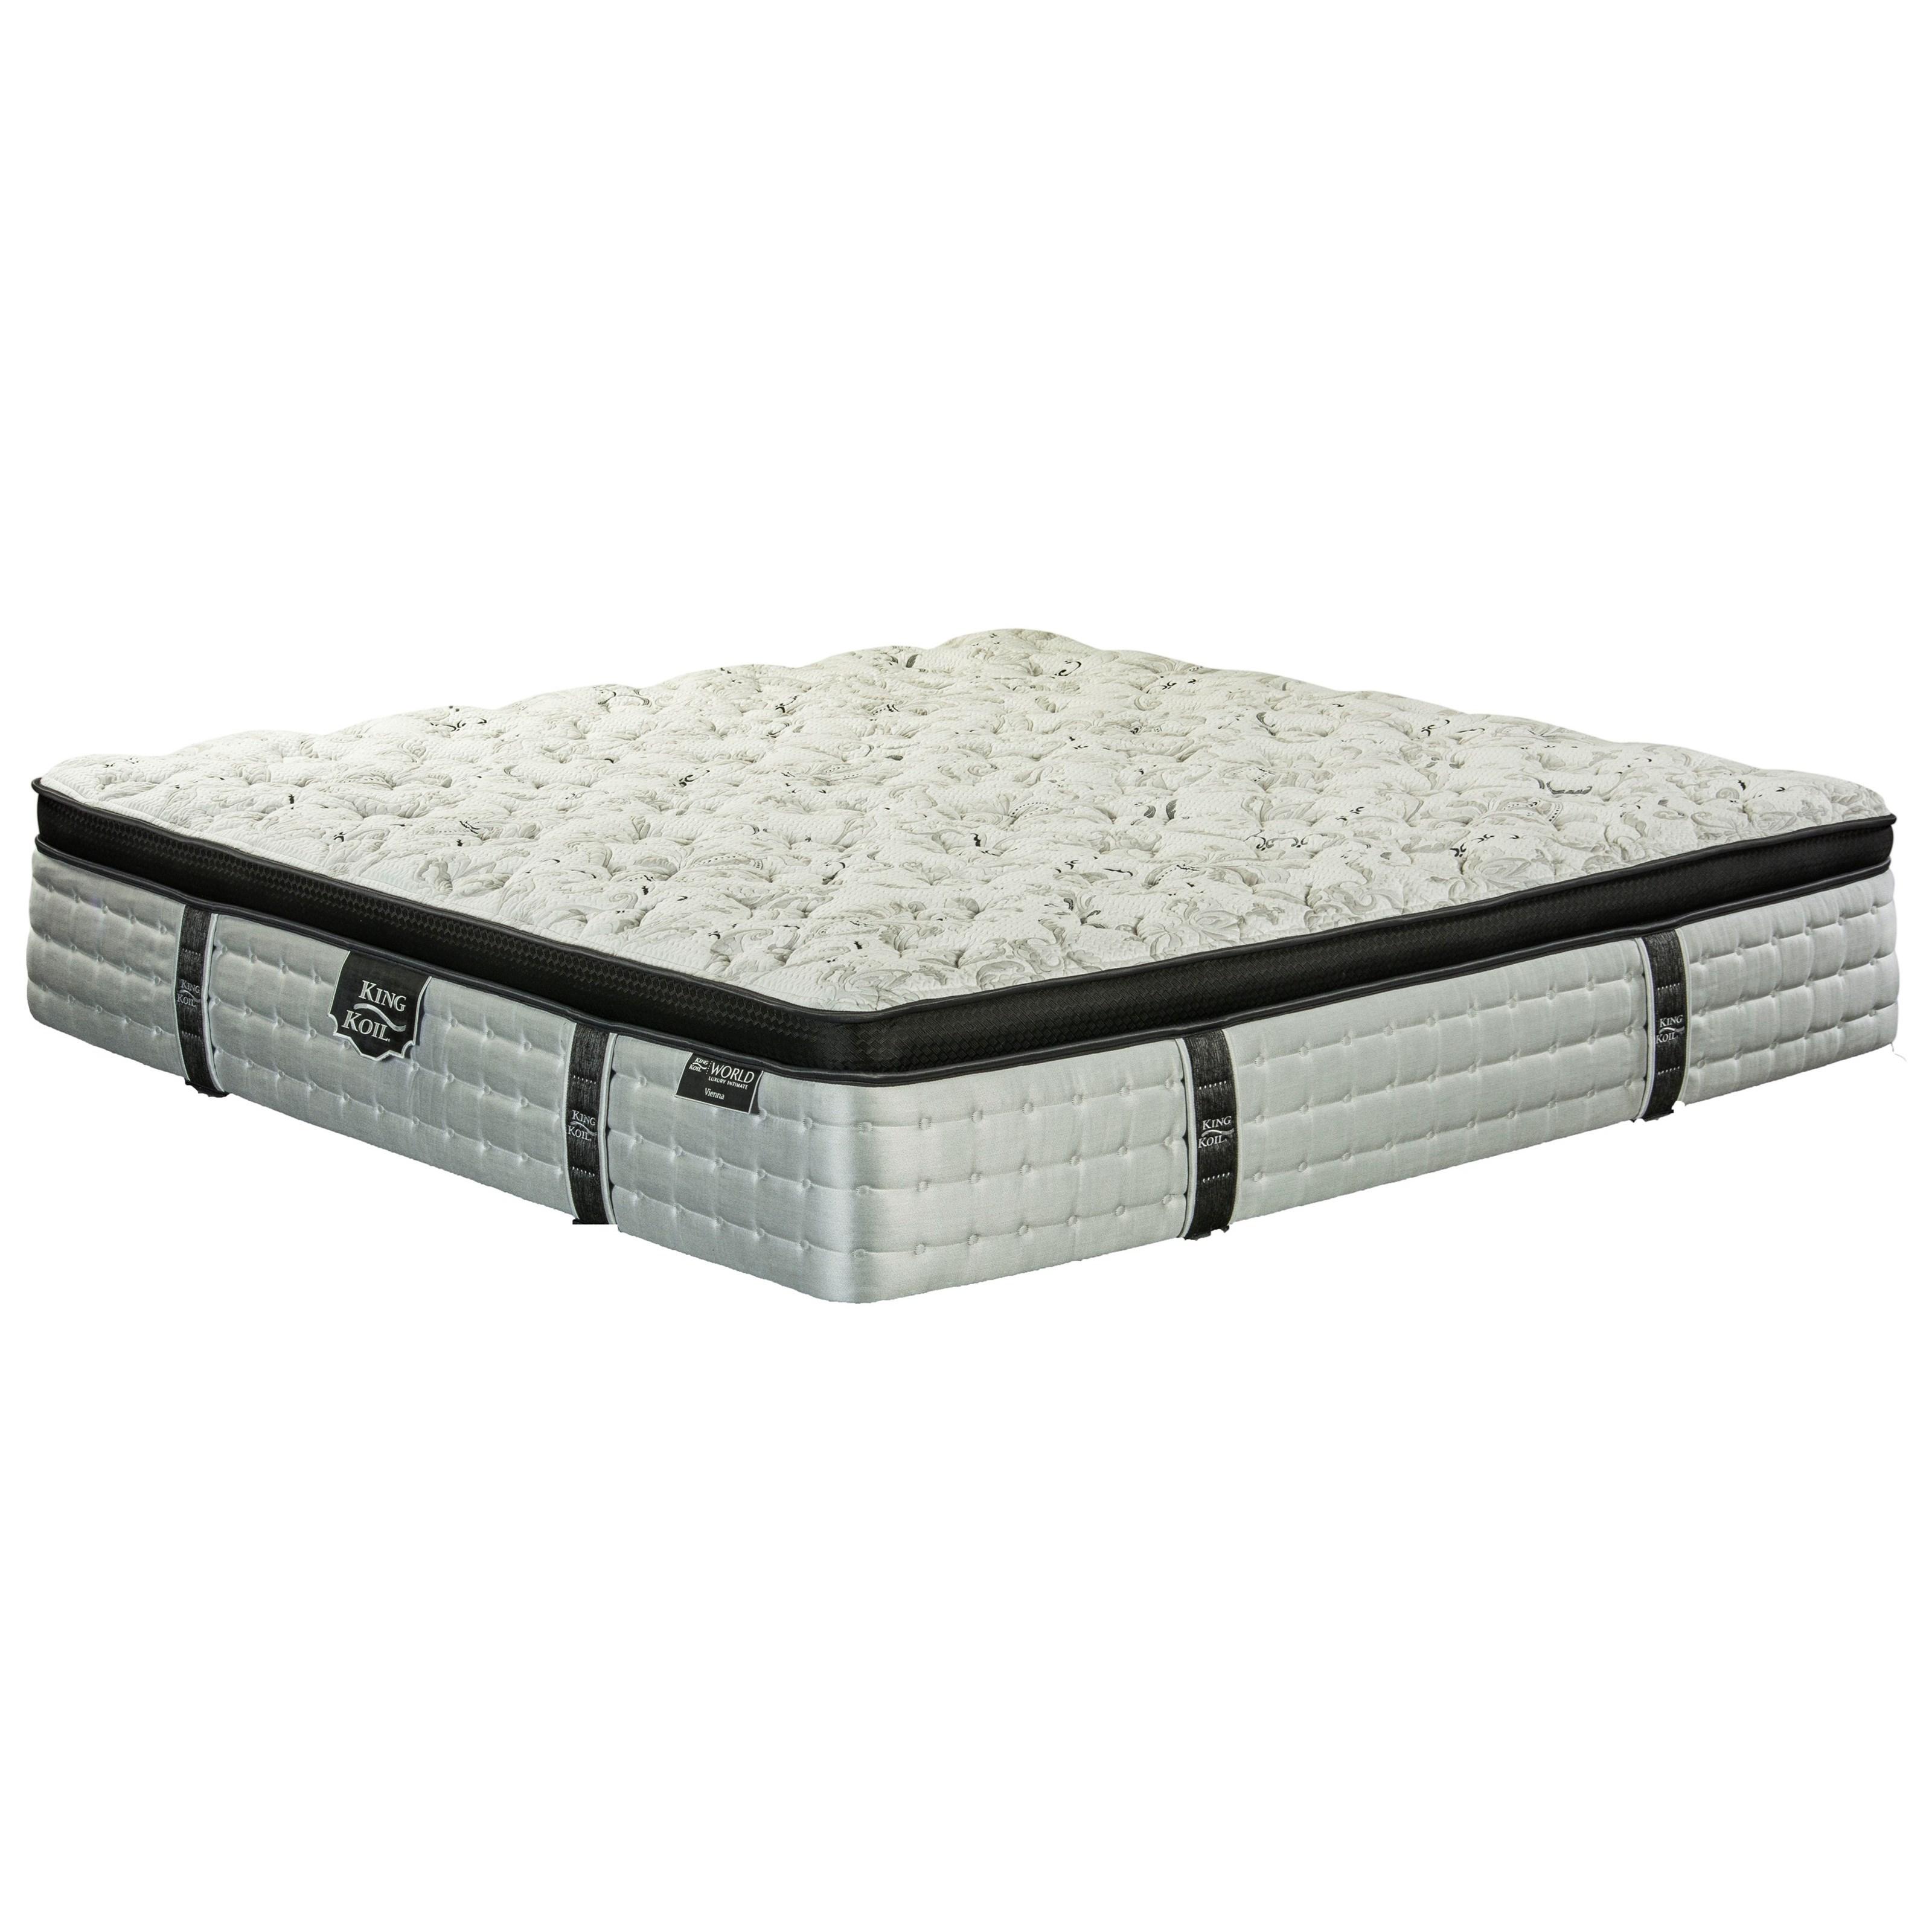 king koil vienna euro top queen euro top mattress item number euroq